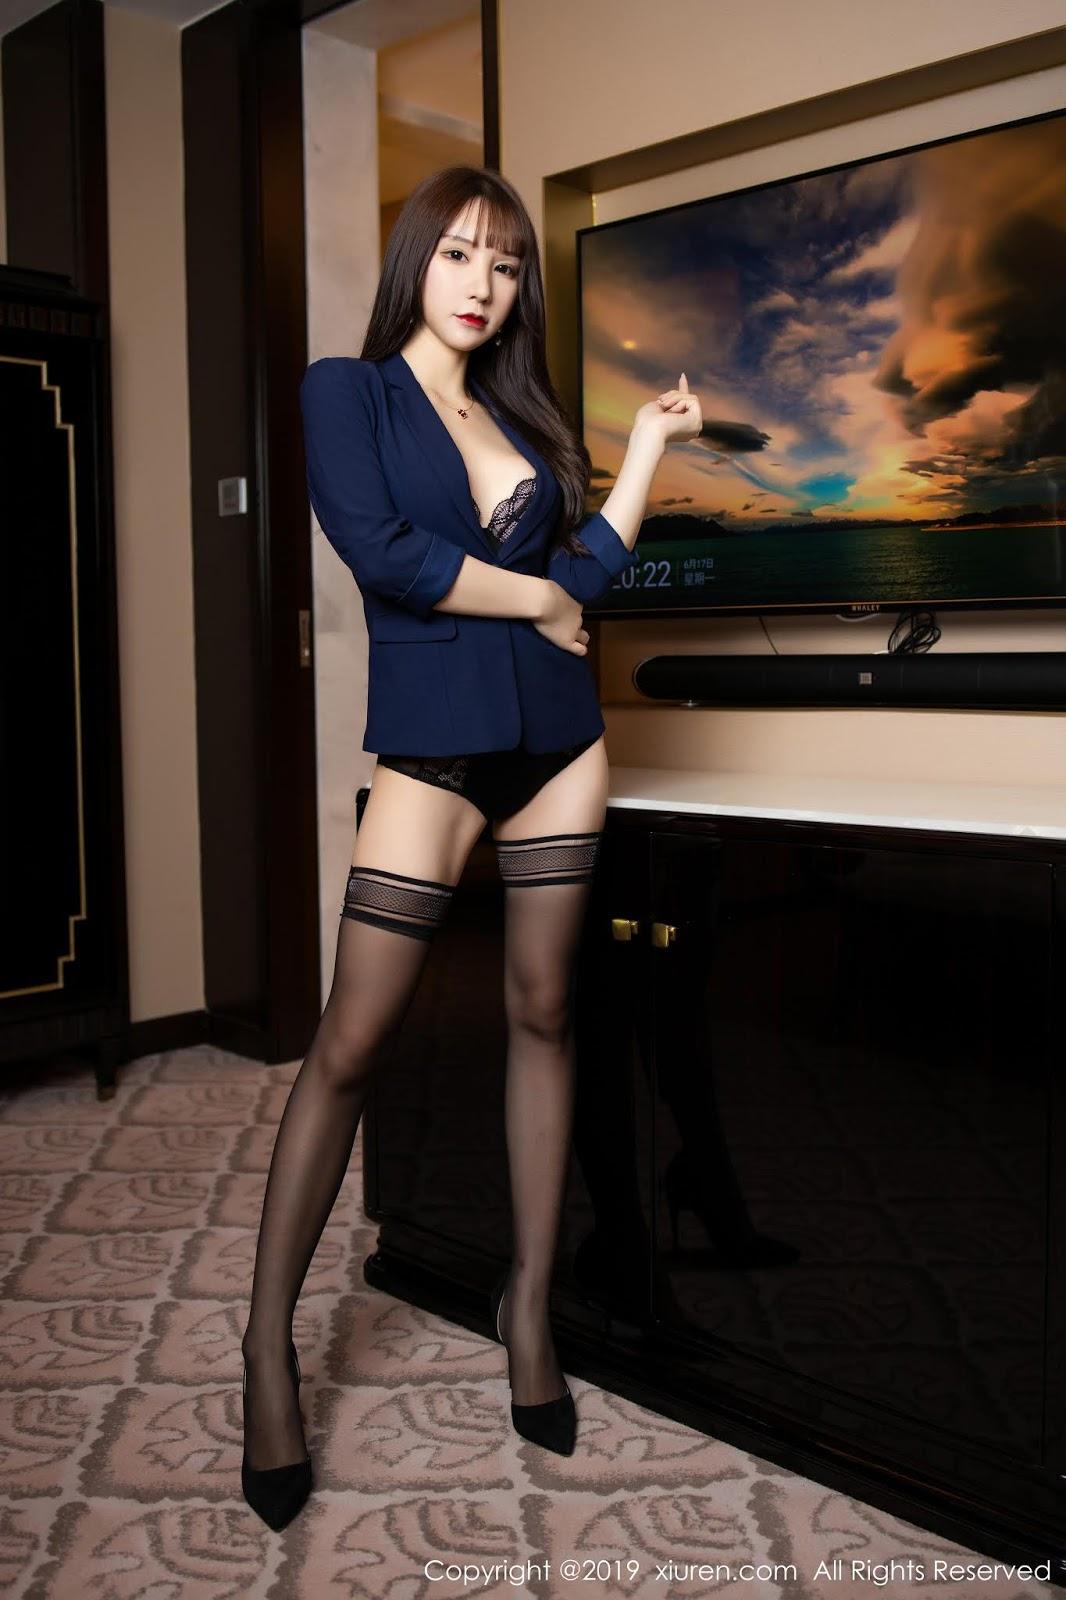 Asiaa.online No.151 Model 周于希Sandy